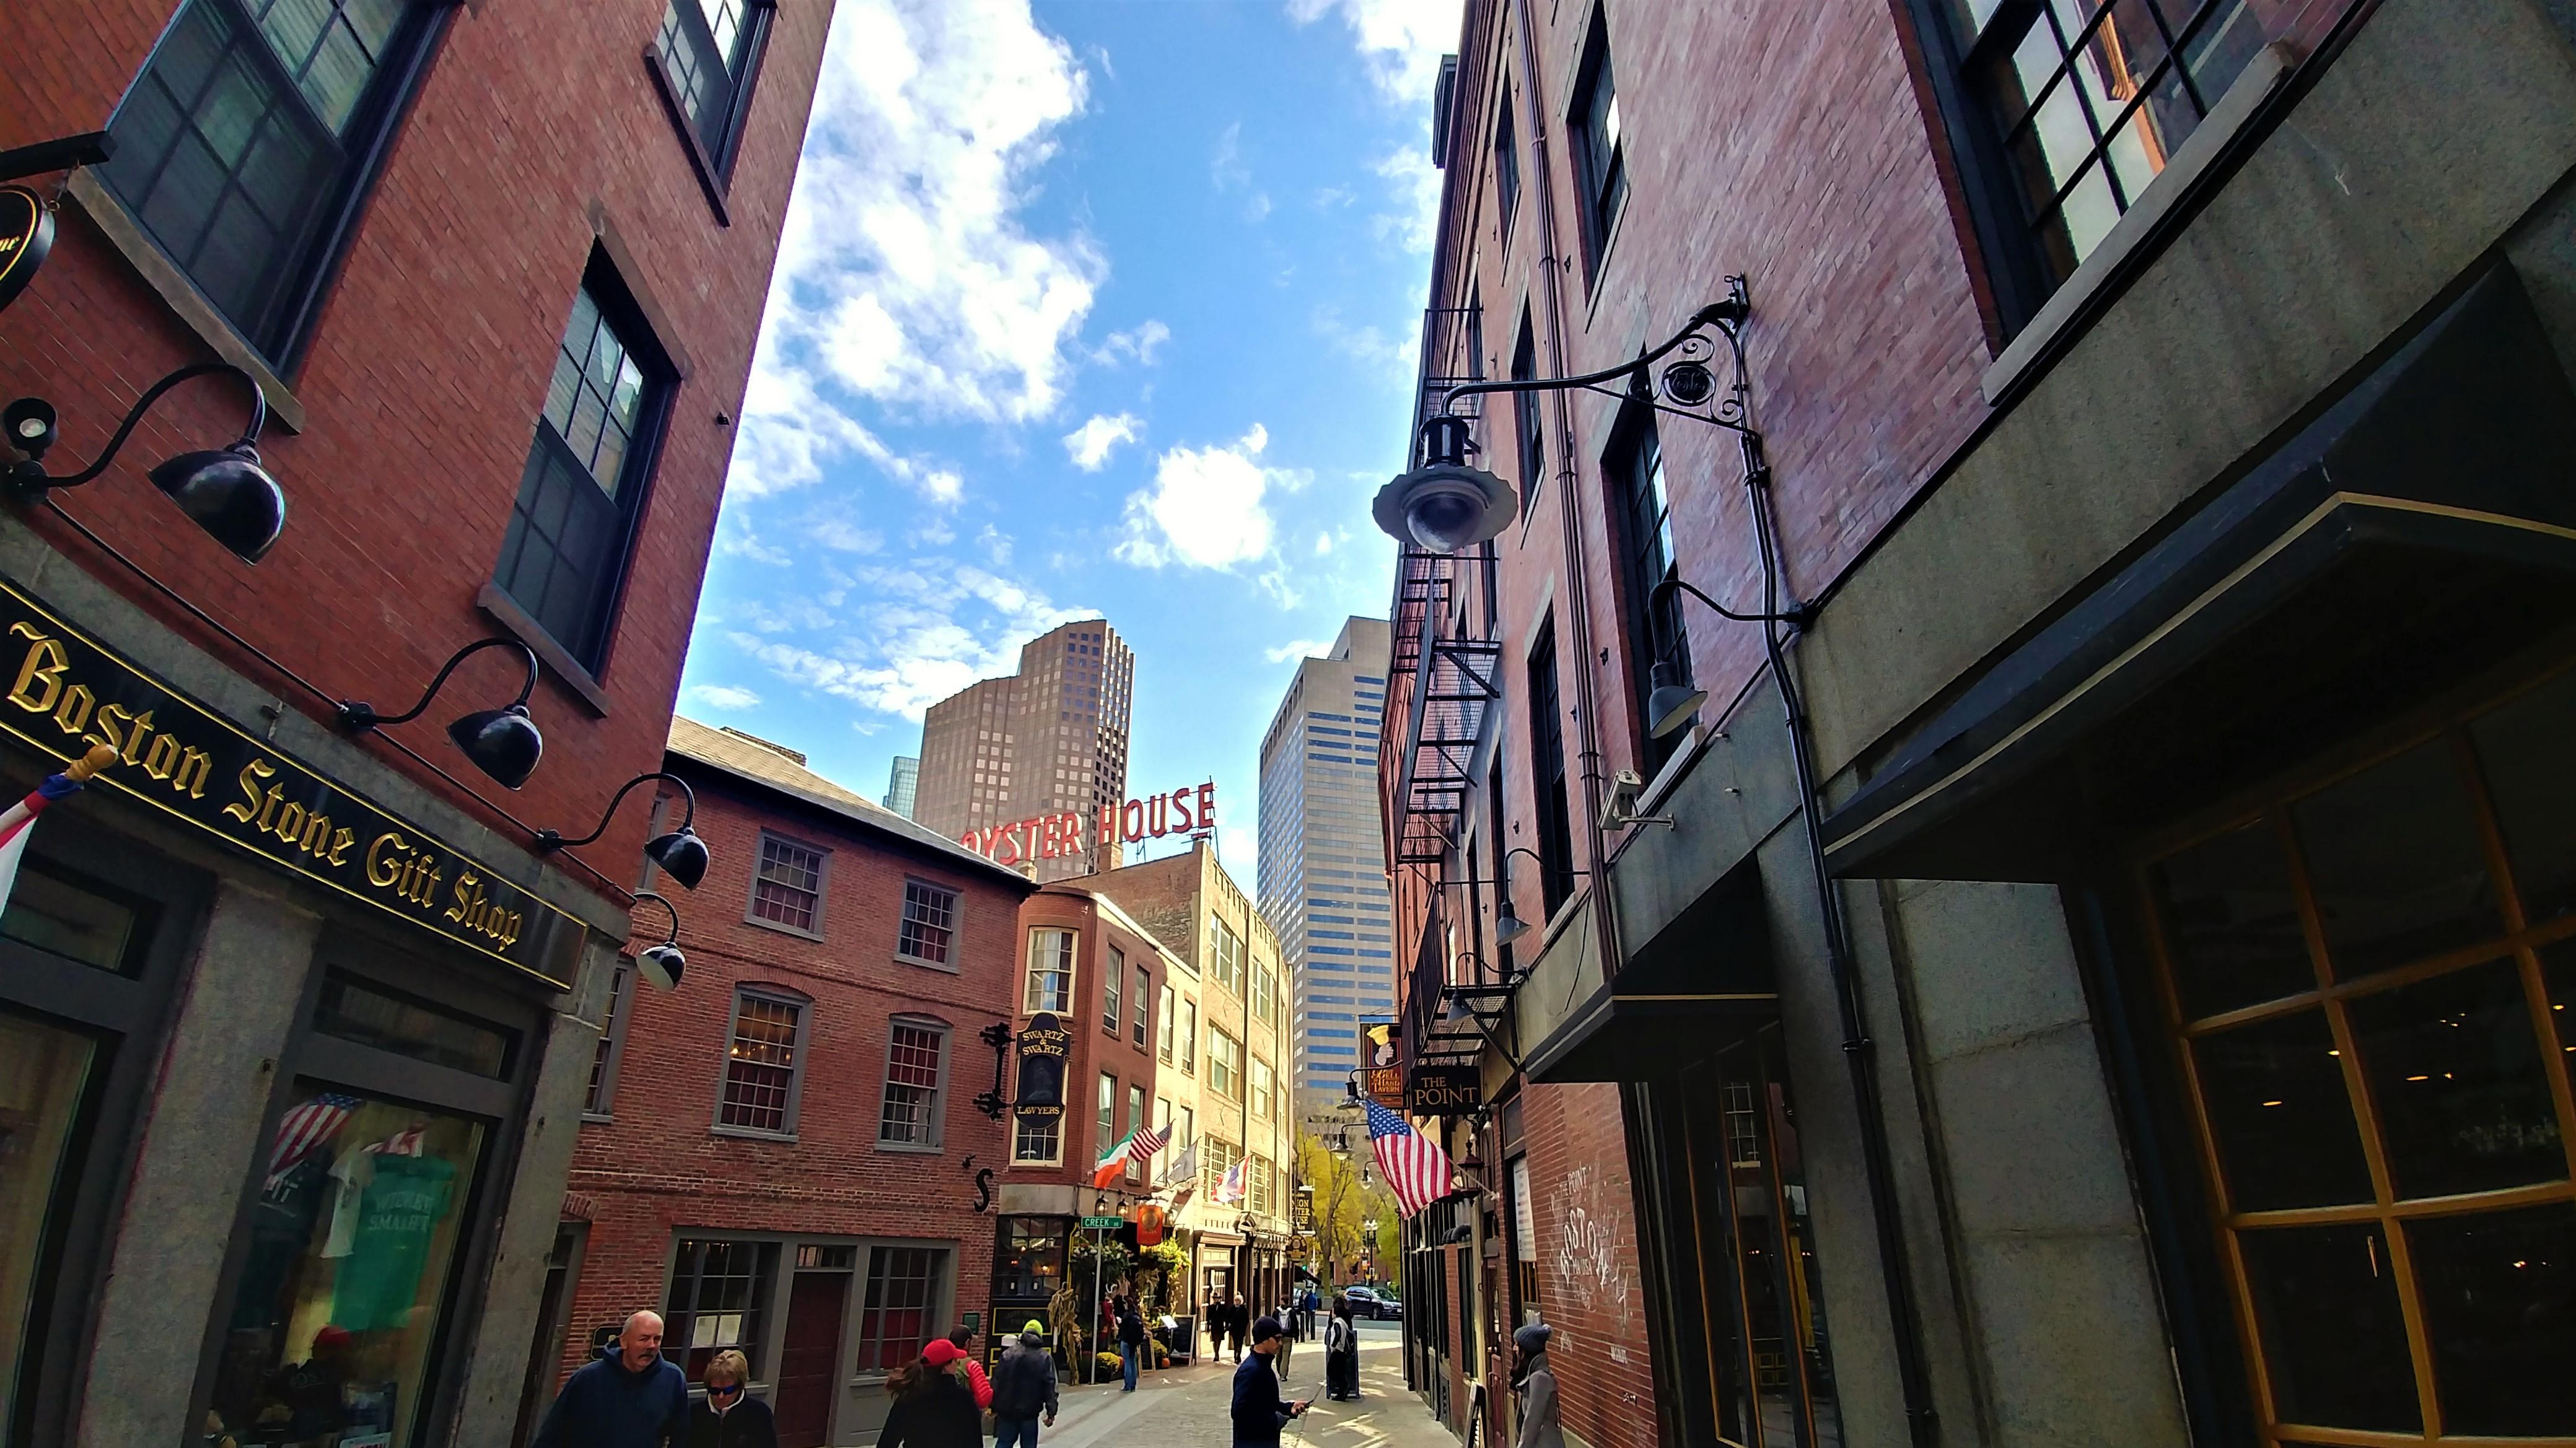 freedom trail boston usa voyage road-trip halloween